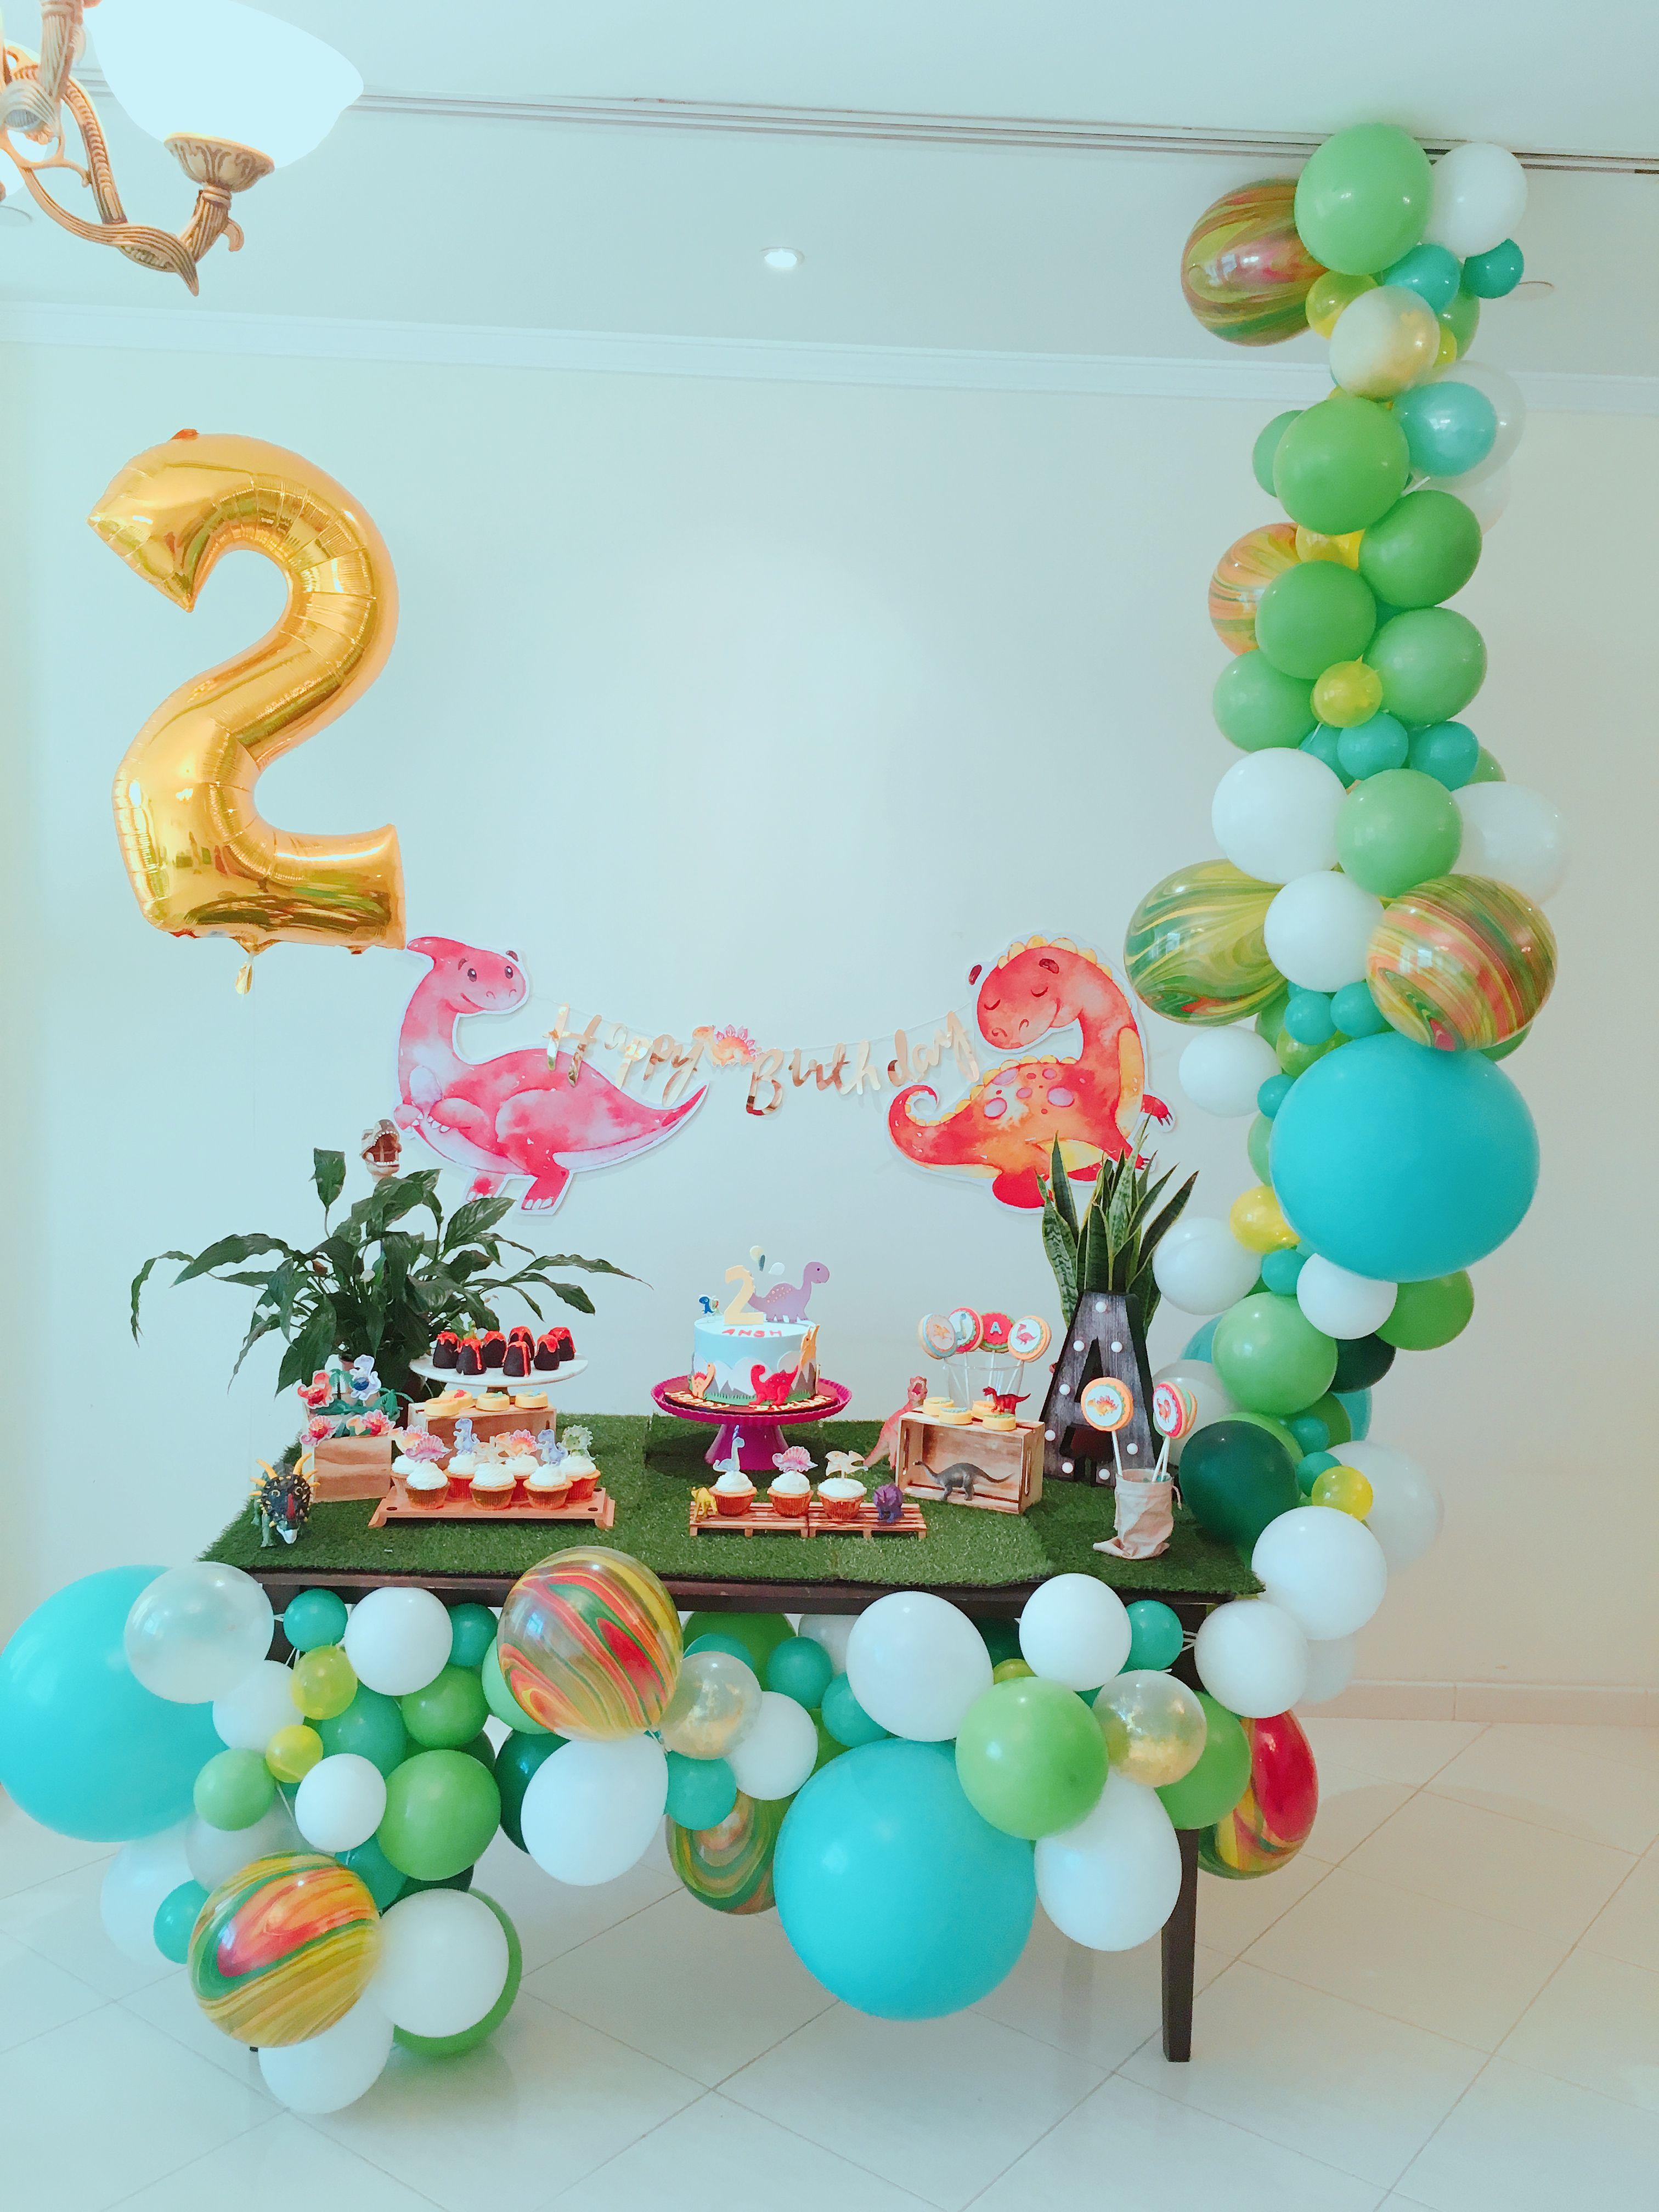 Dinosaur Theme Birthday Dessert Table Setup With Balloon Garland